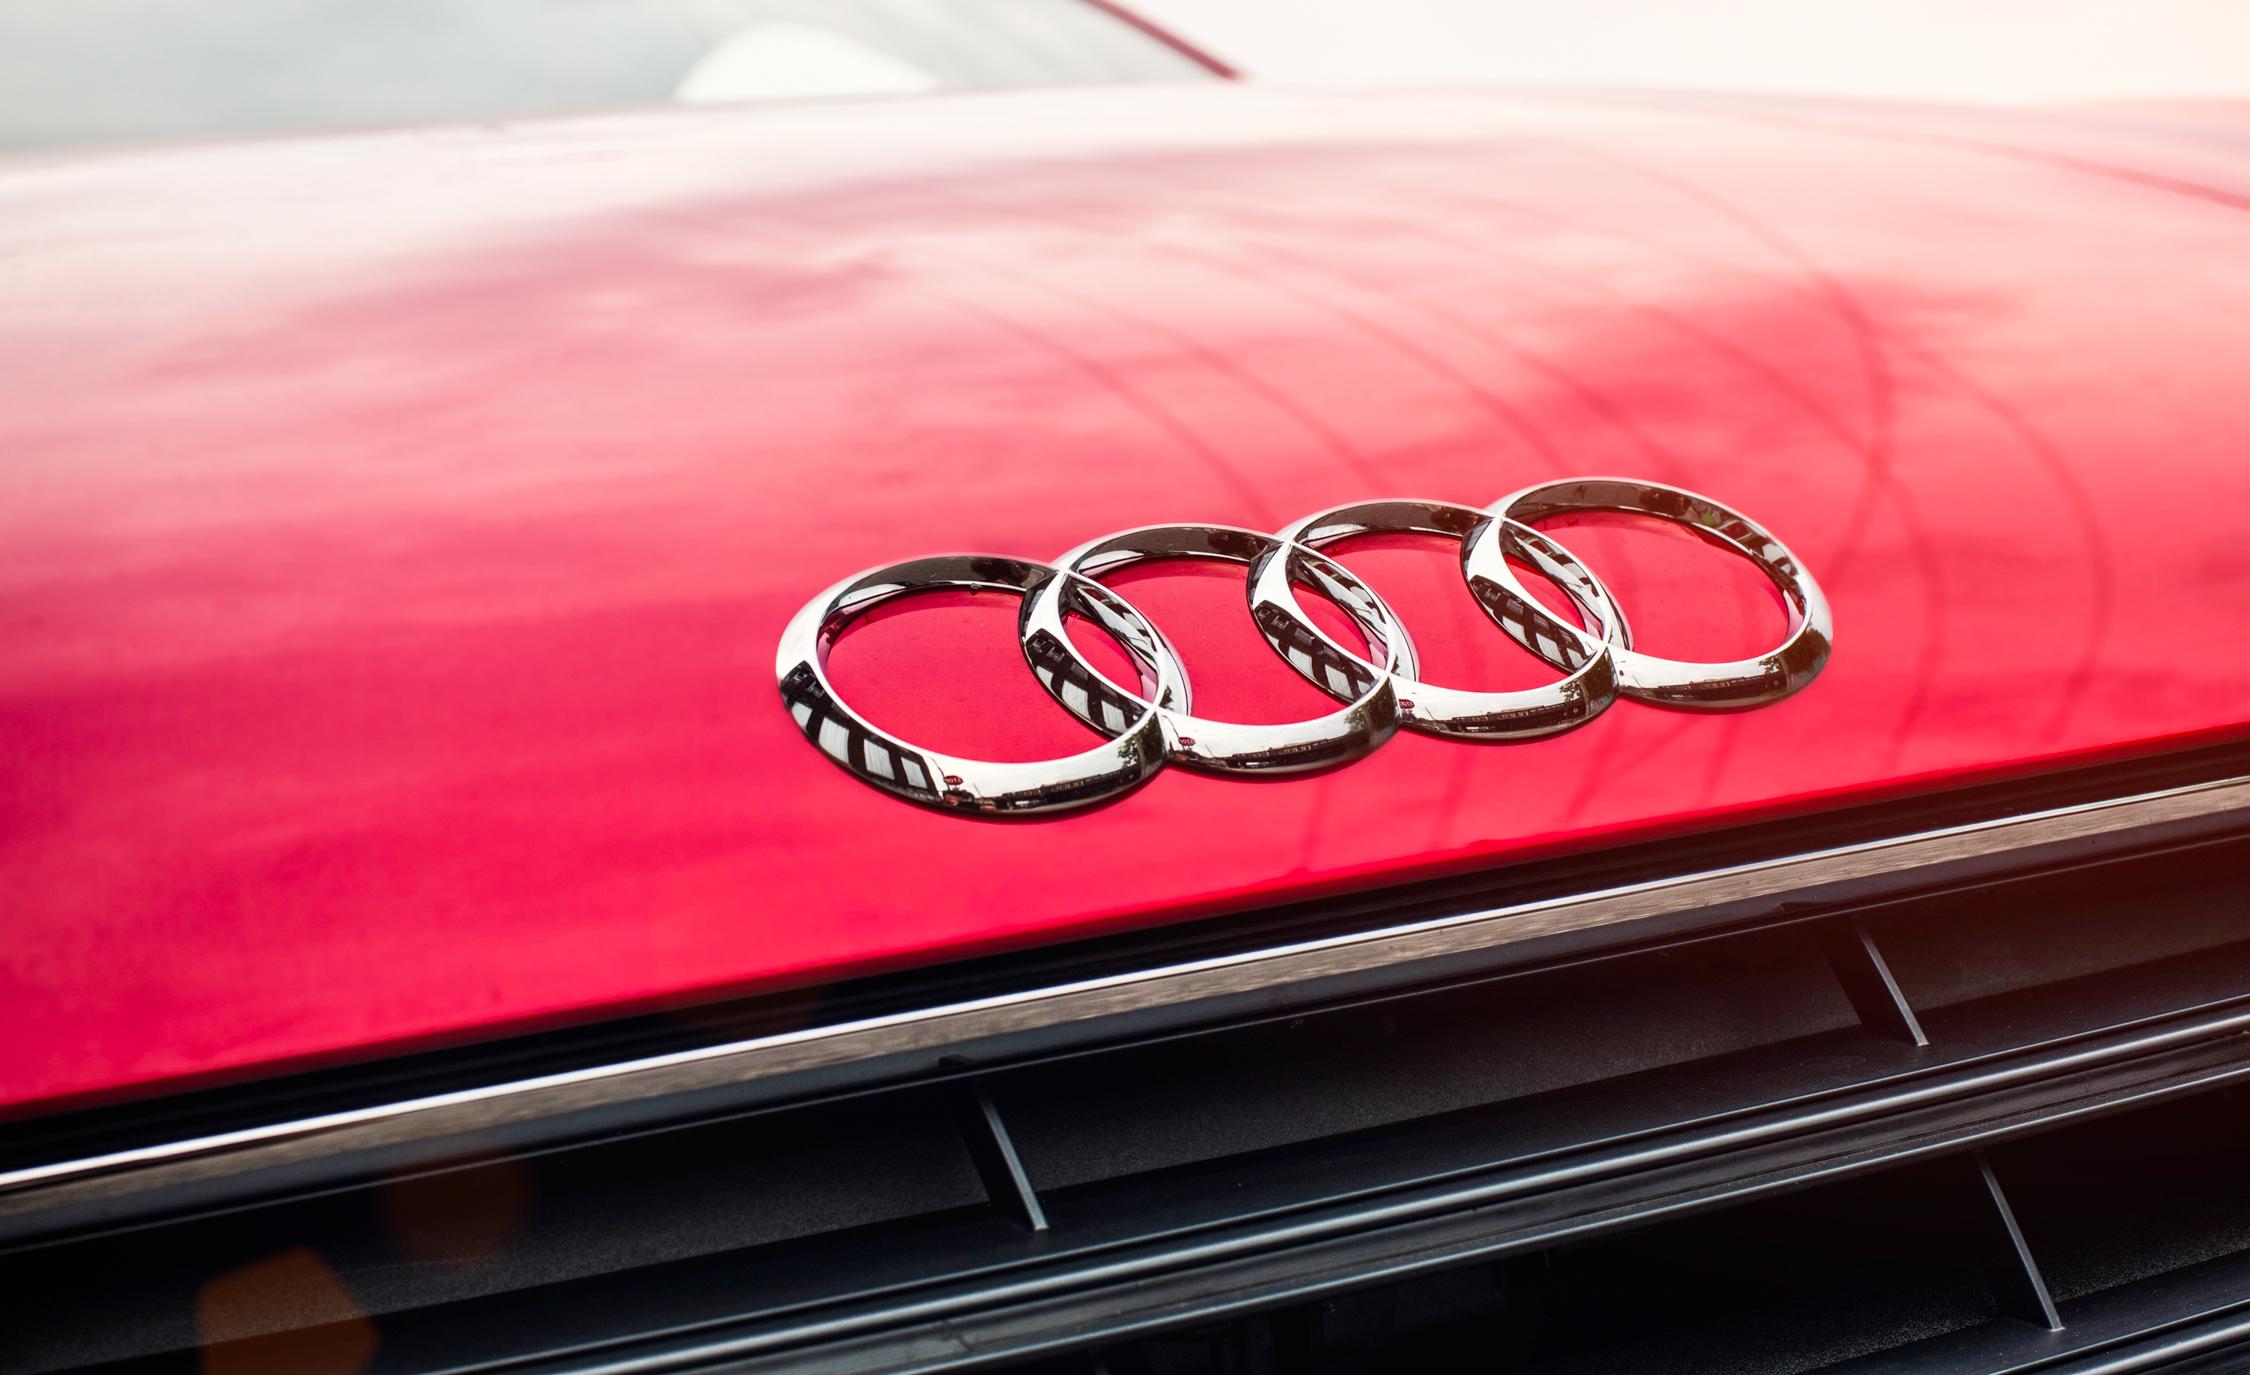 2016 Audi TT Coupe Exterior Front Badge